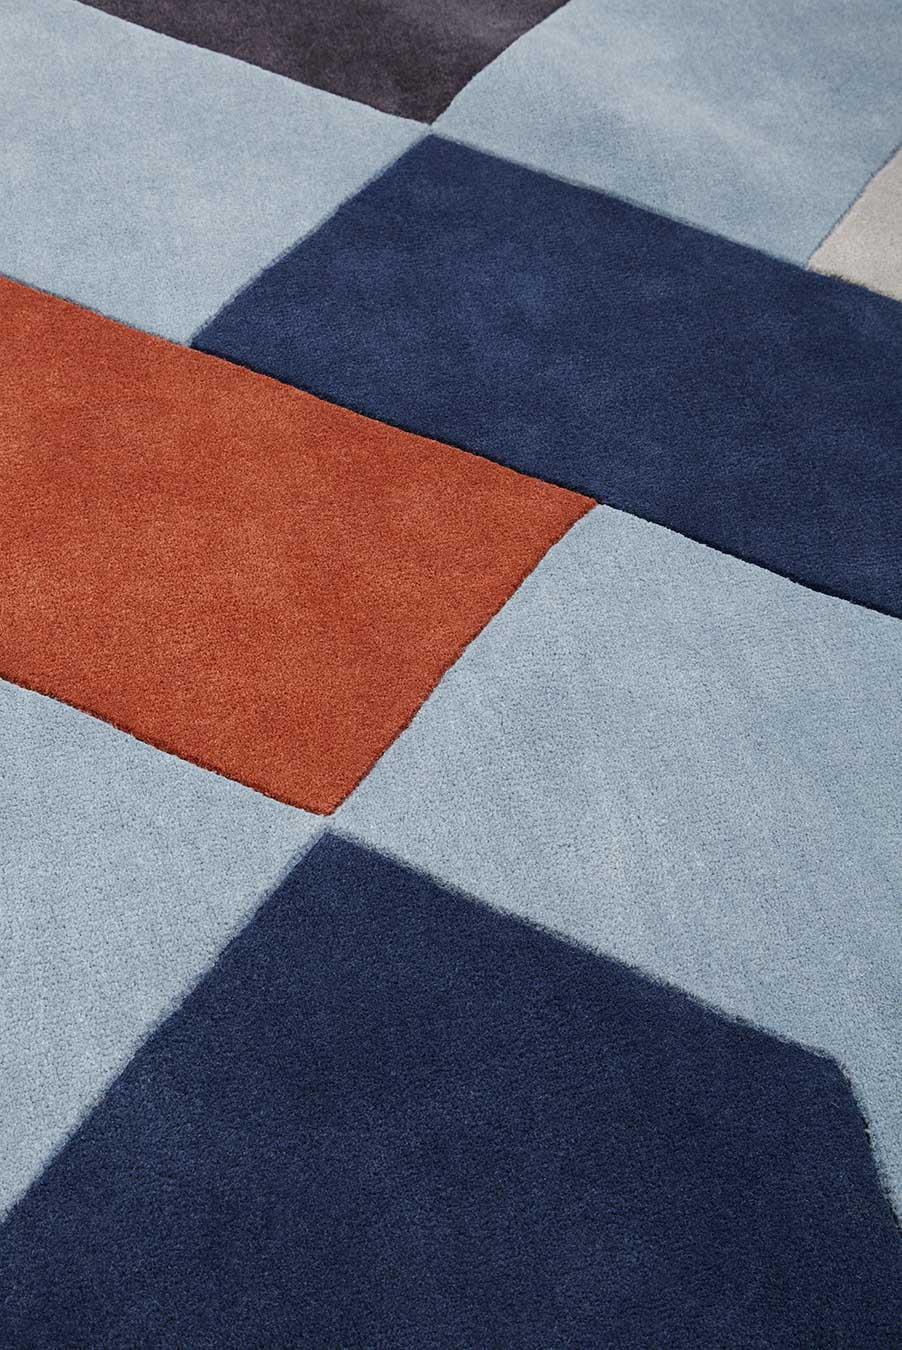 detailed image of geometric Fuse rug